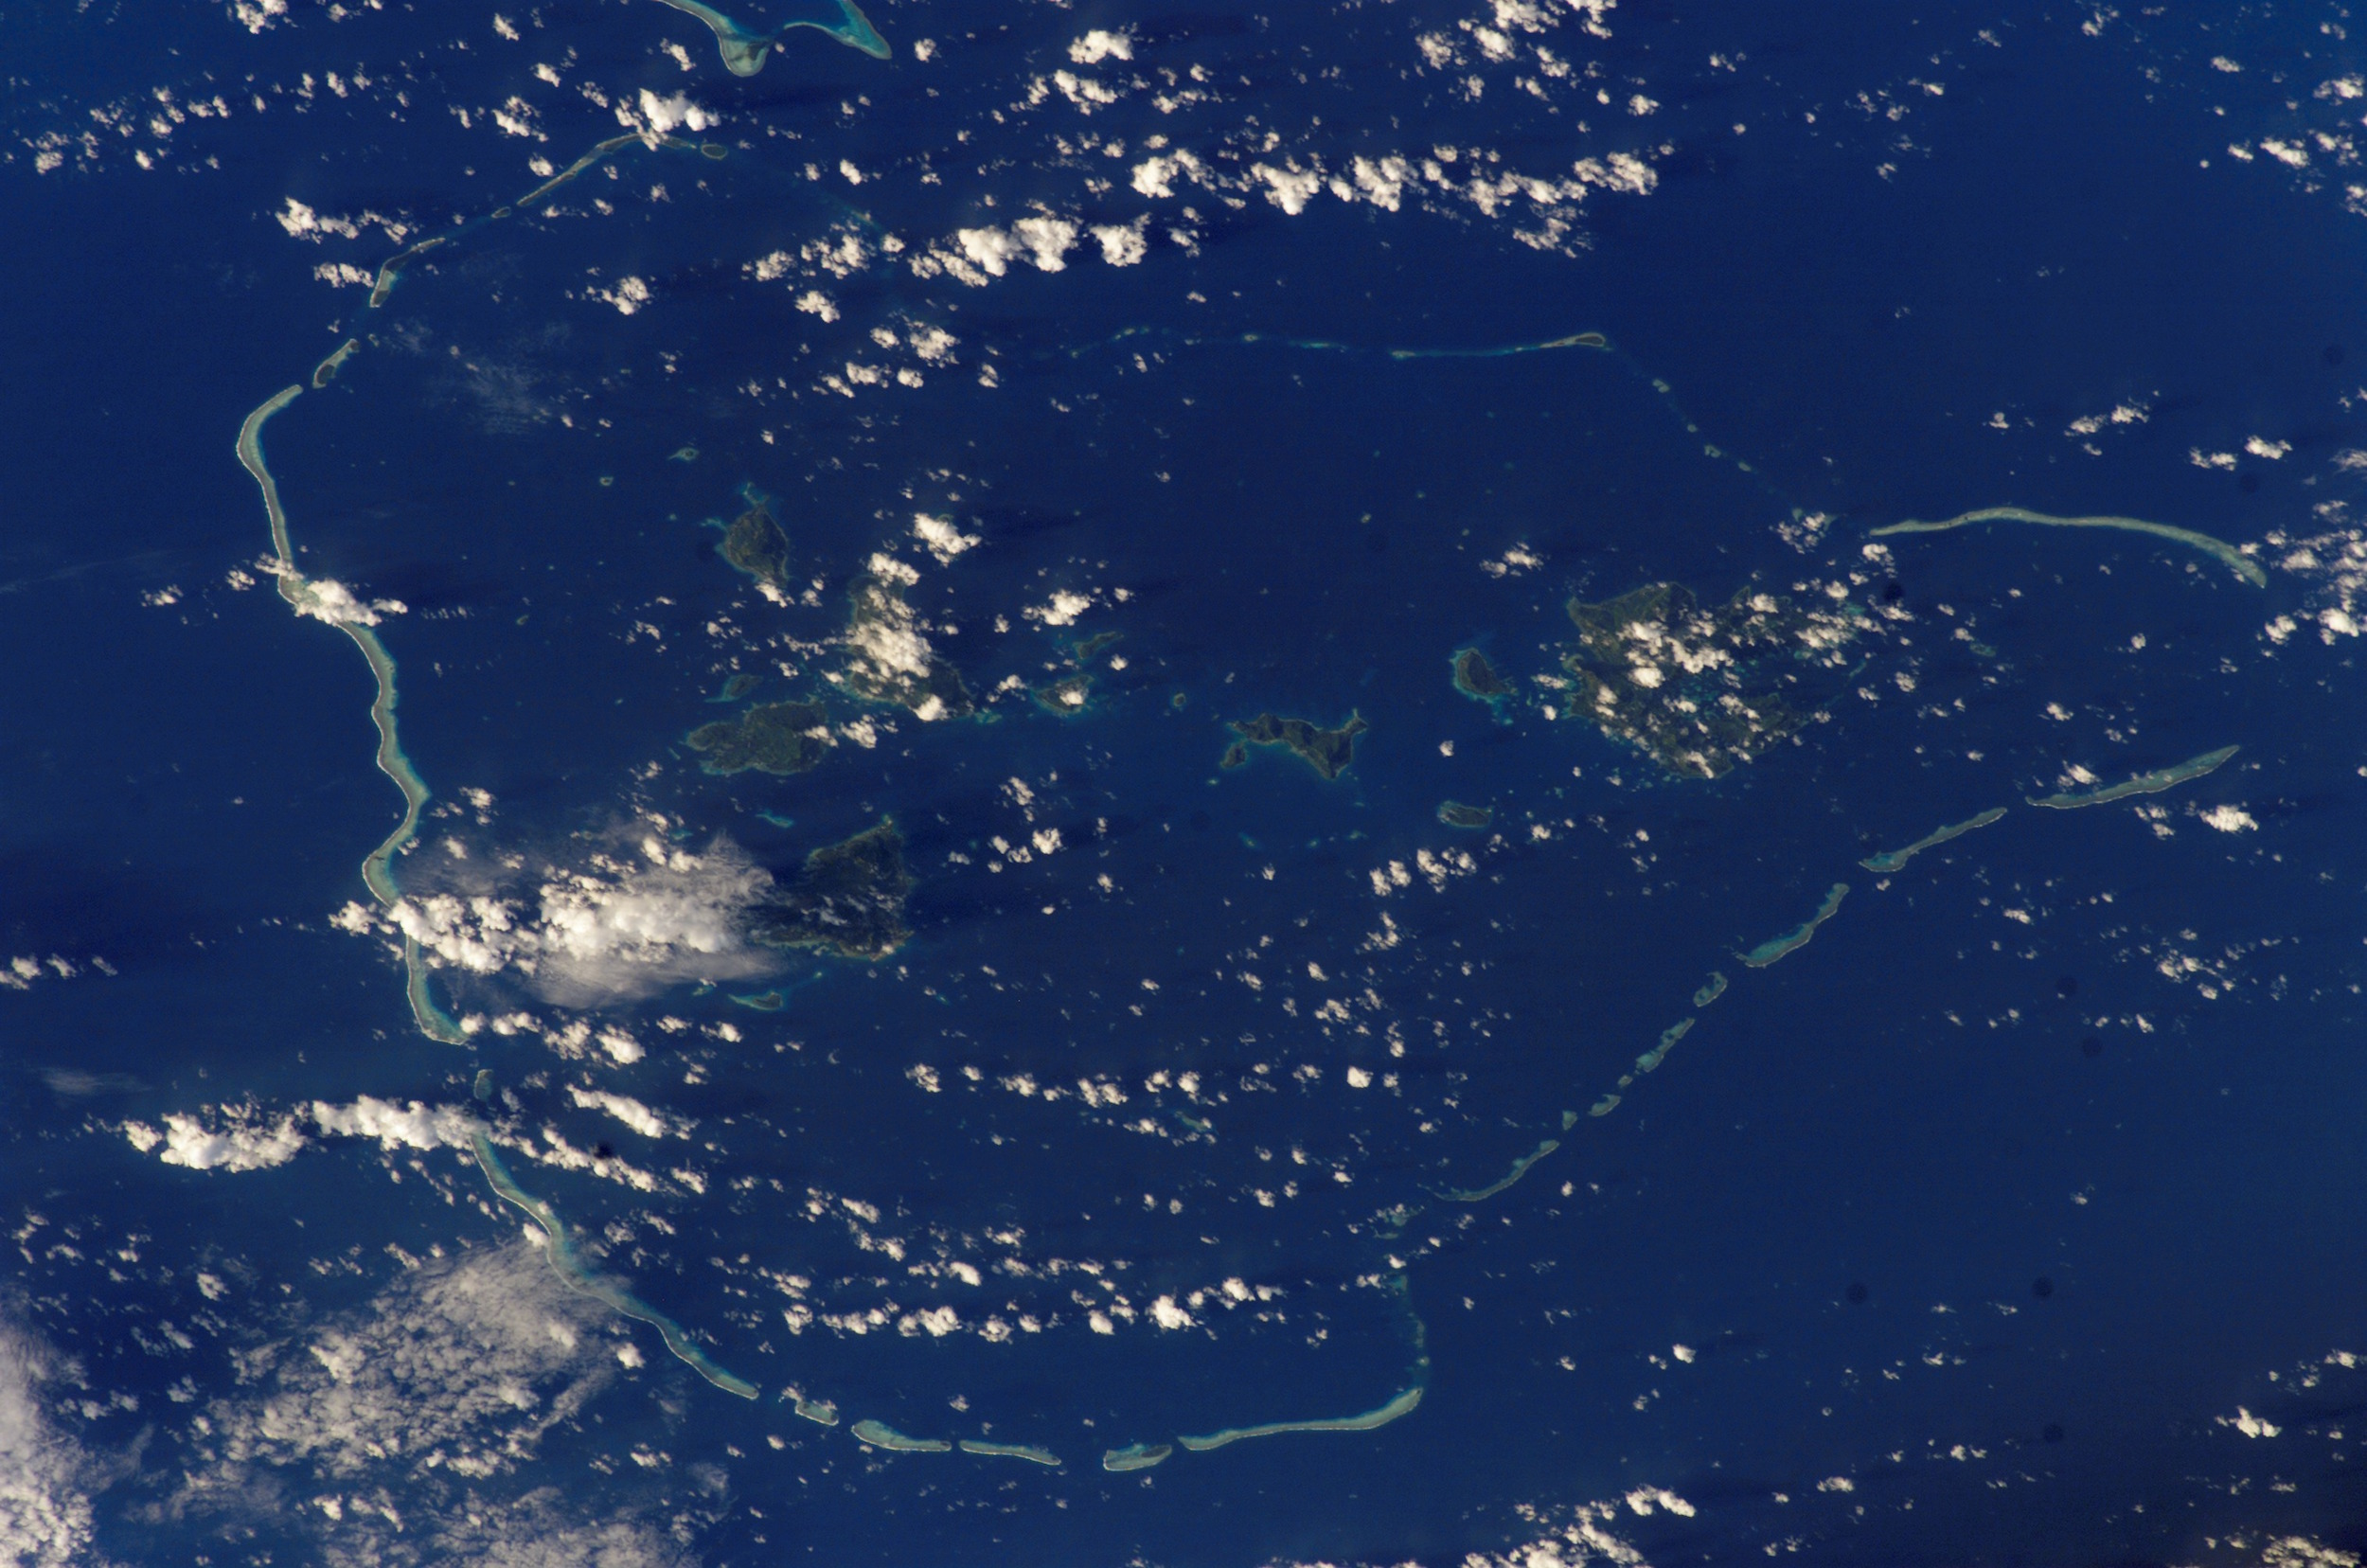 Picture-2-Chuuk-Lagoon-Satilite.jpg